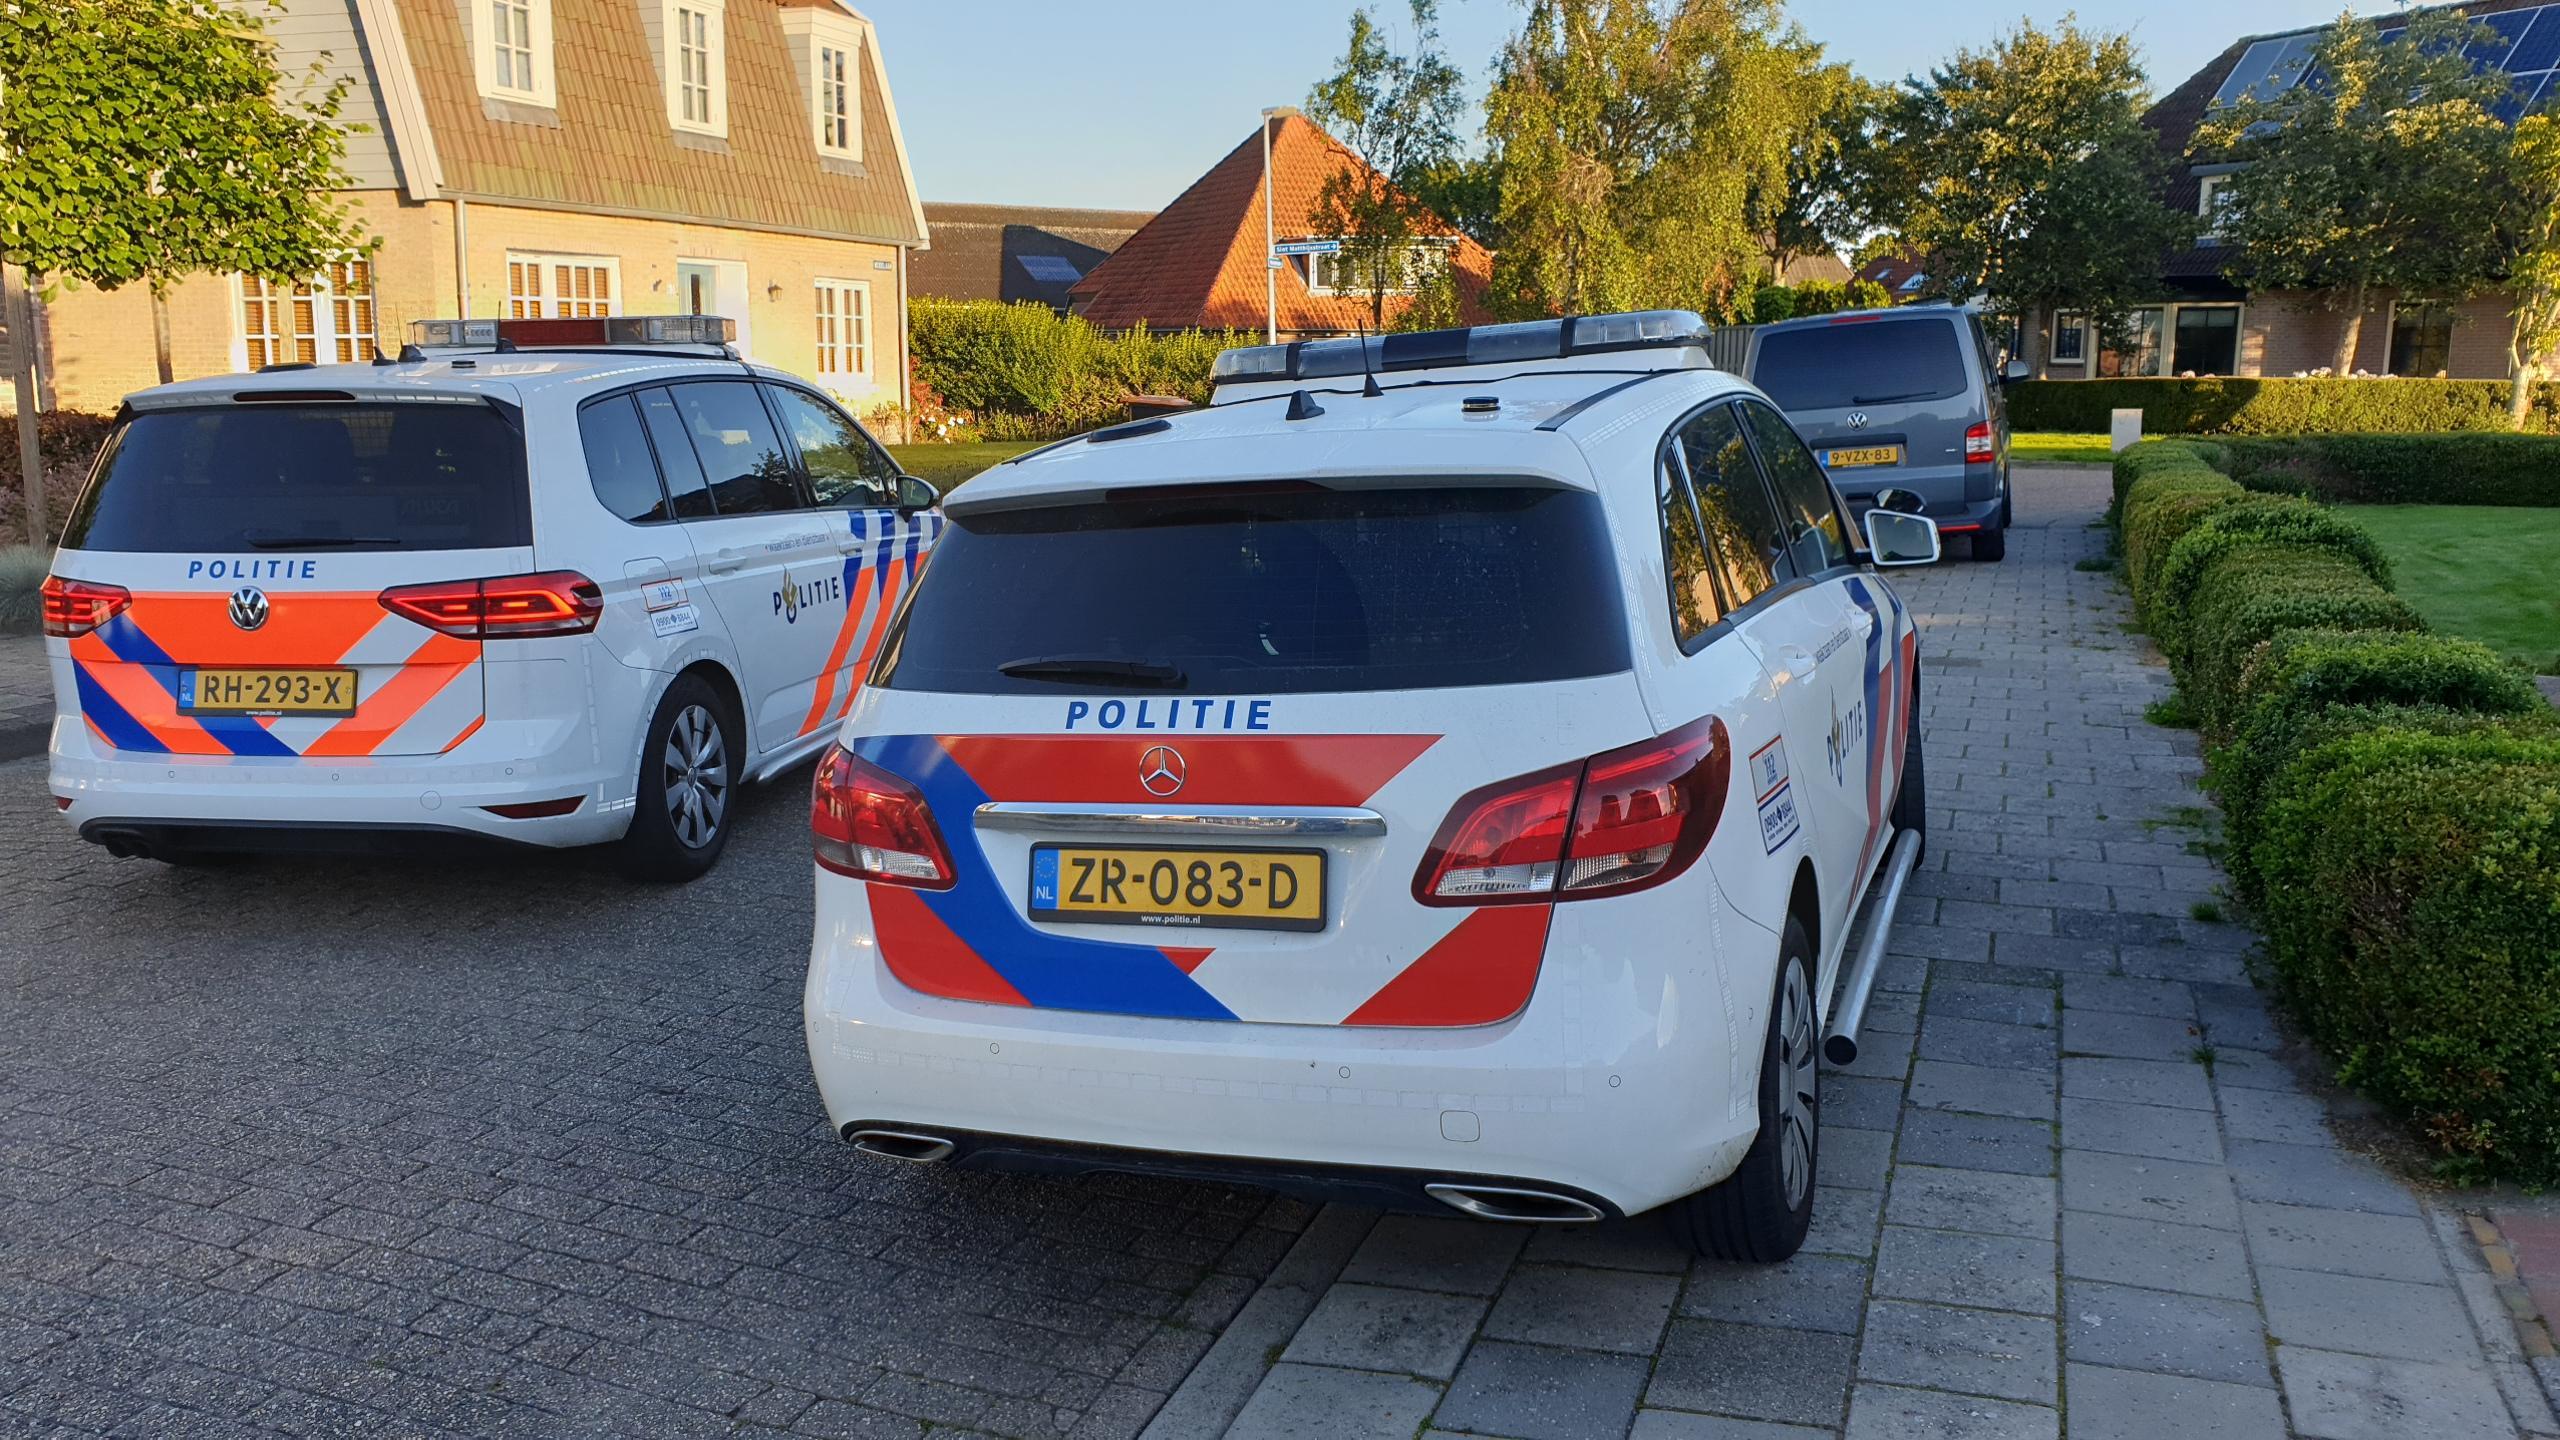 Oudere man lichtgewond na confrontatie met inbreker in woning Nibbixwoud